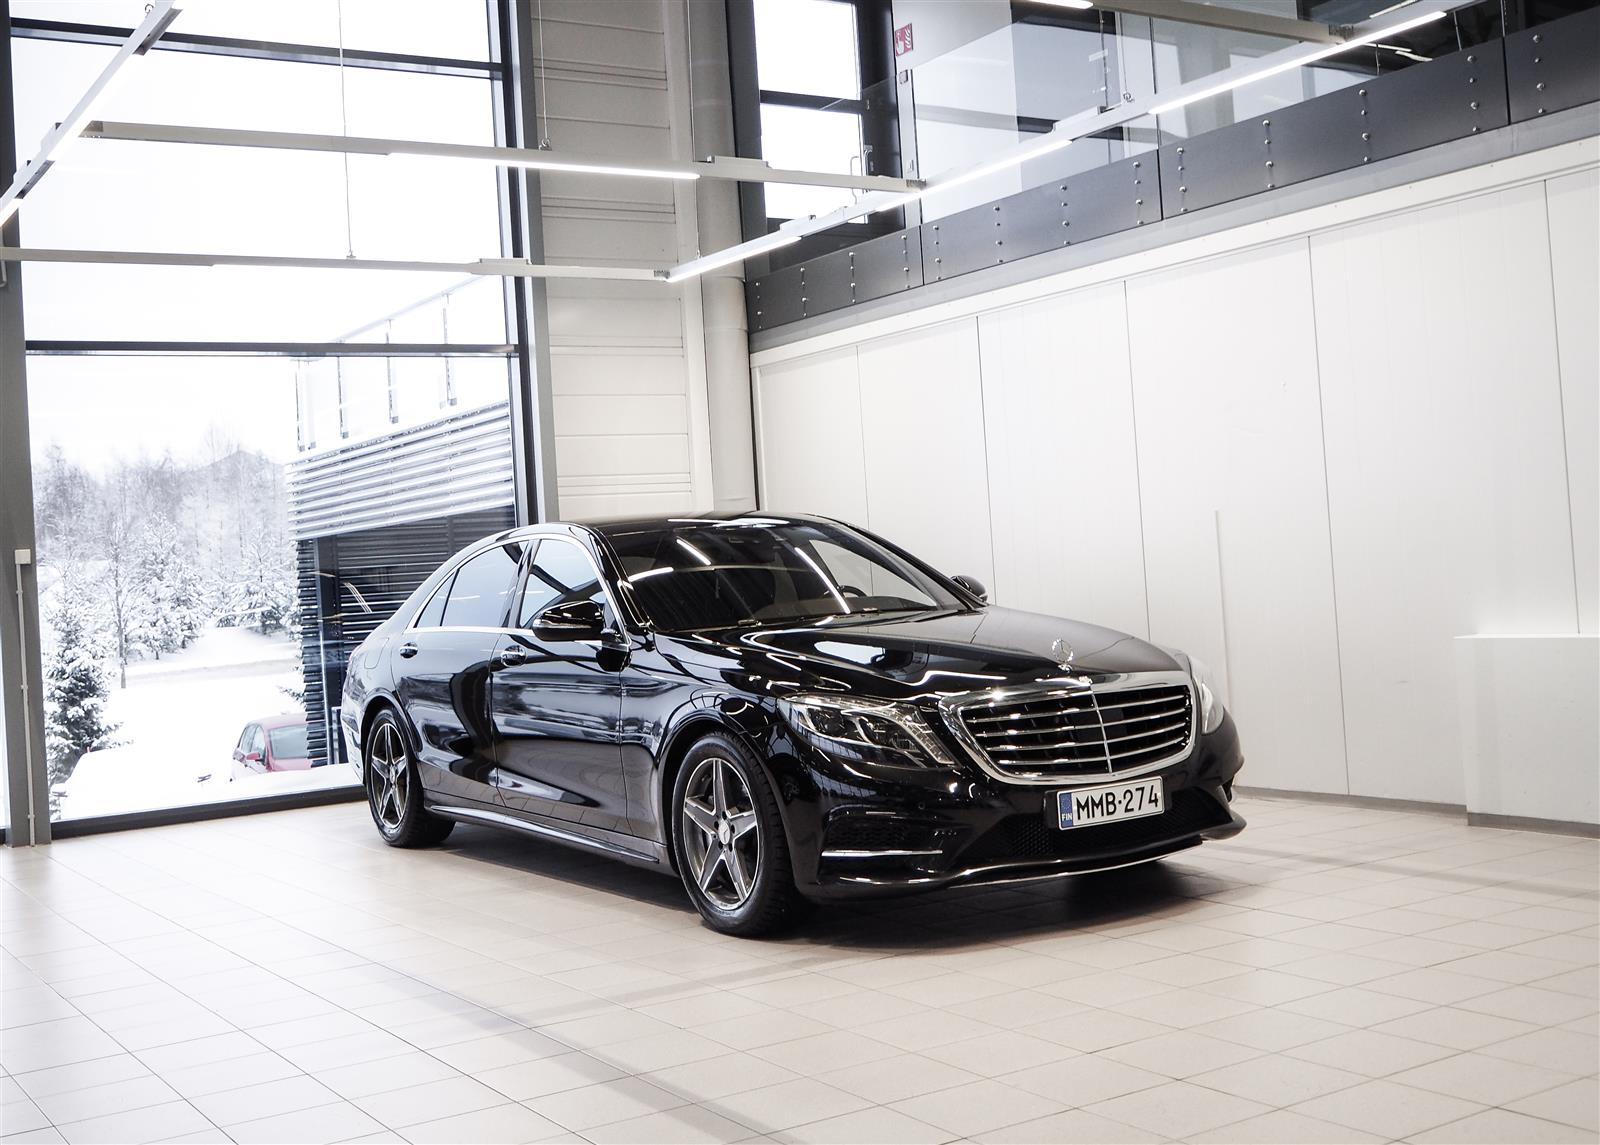 Mercedes-Benz S 350 BlueTec Lang AMG Exclusive Designo Aut + Webasto + Huippuvarusteet!